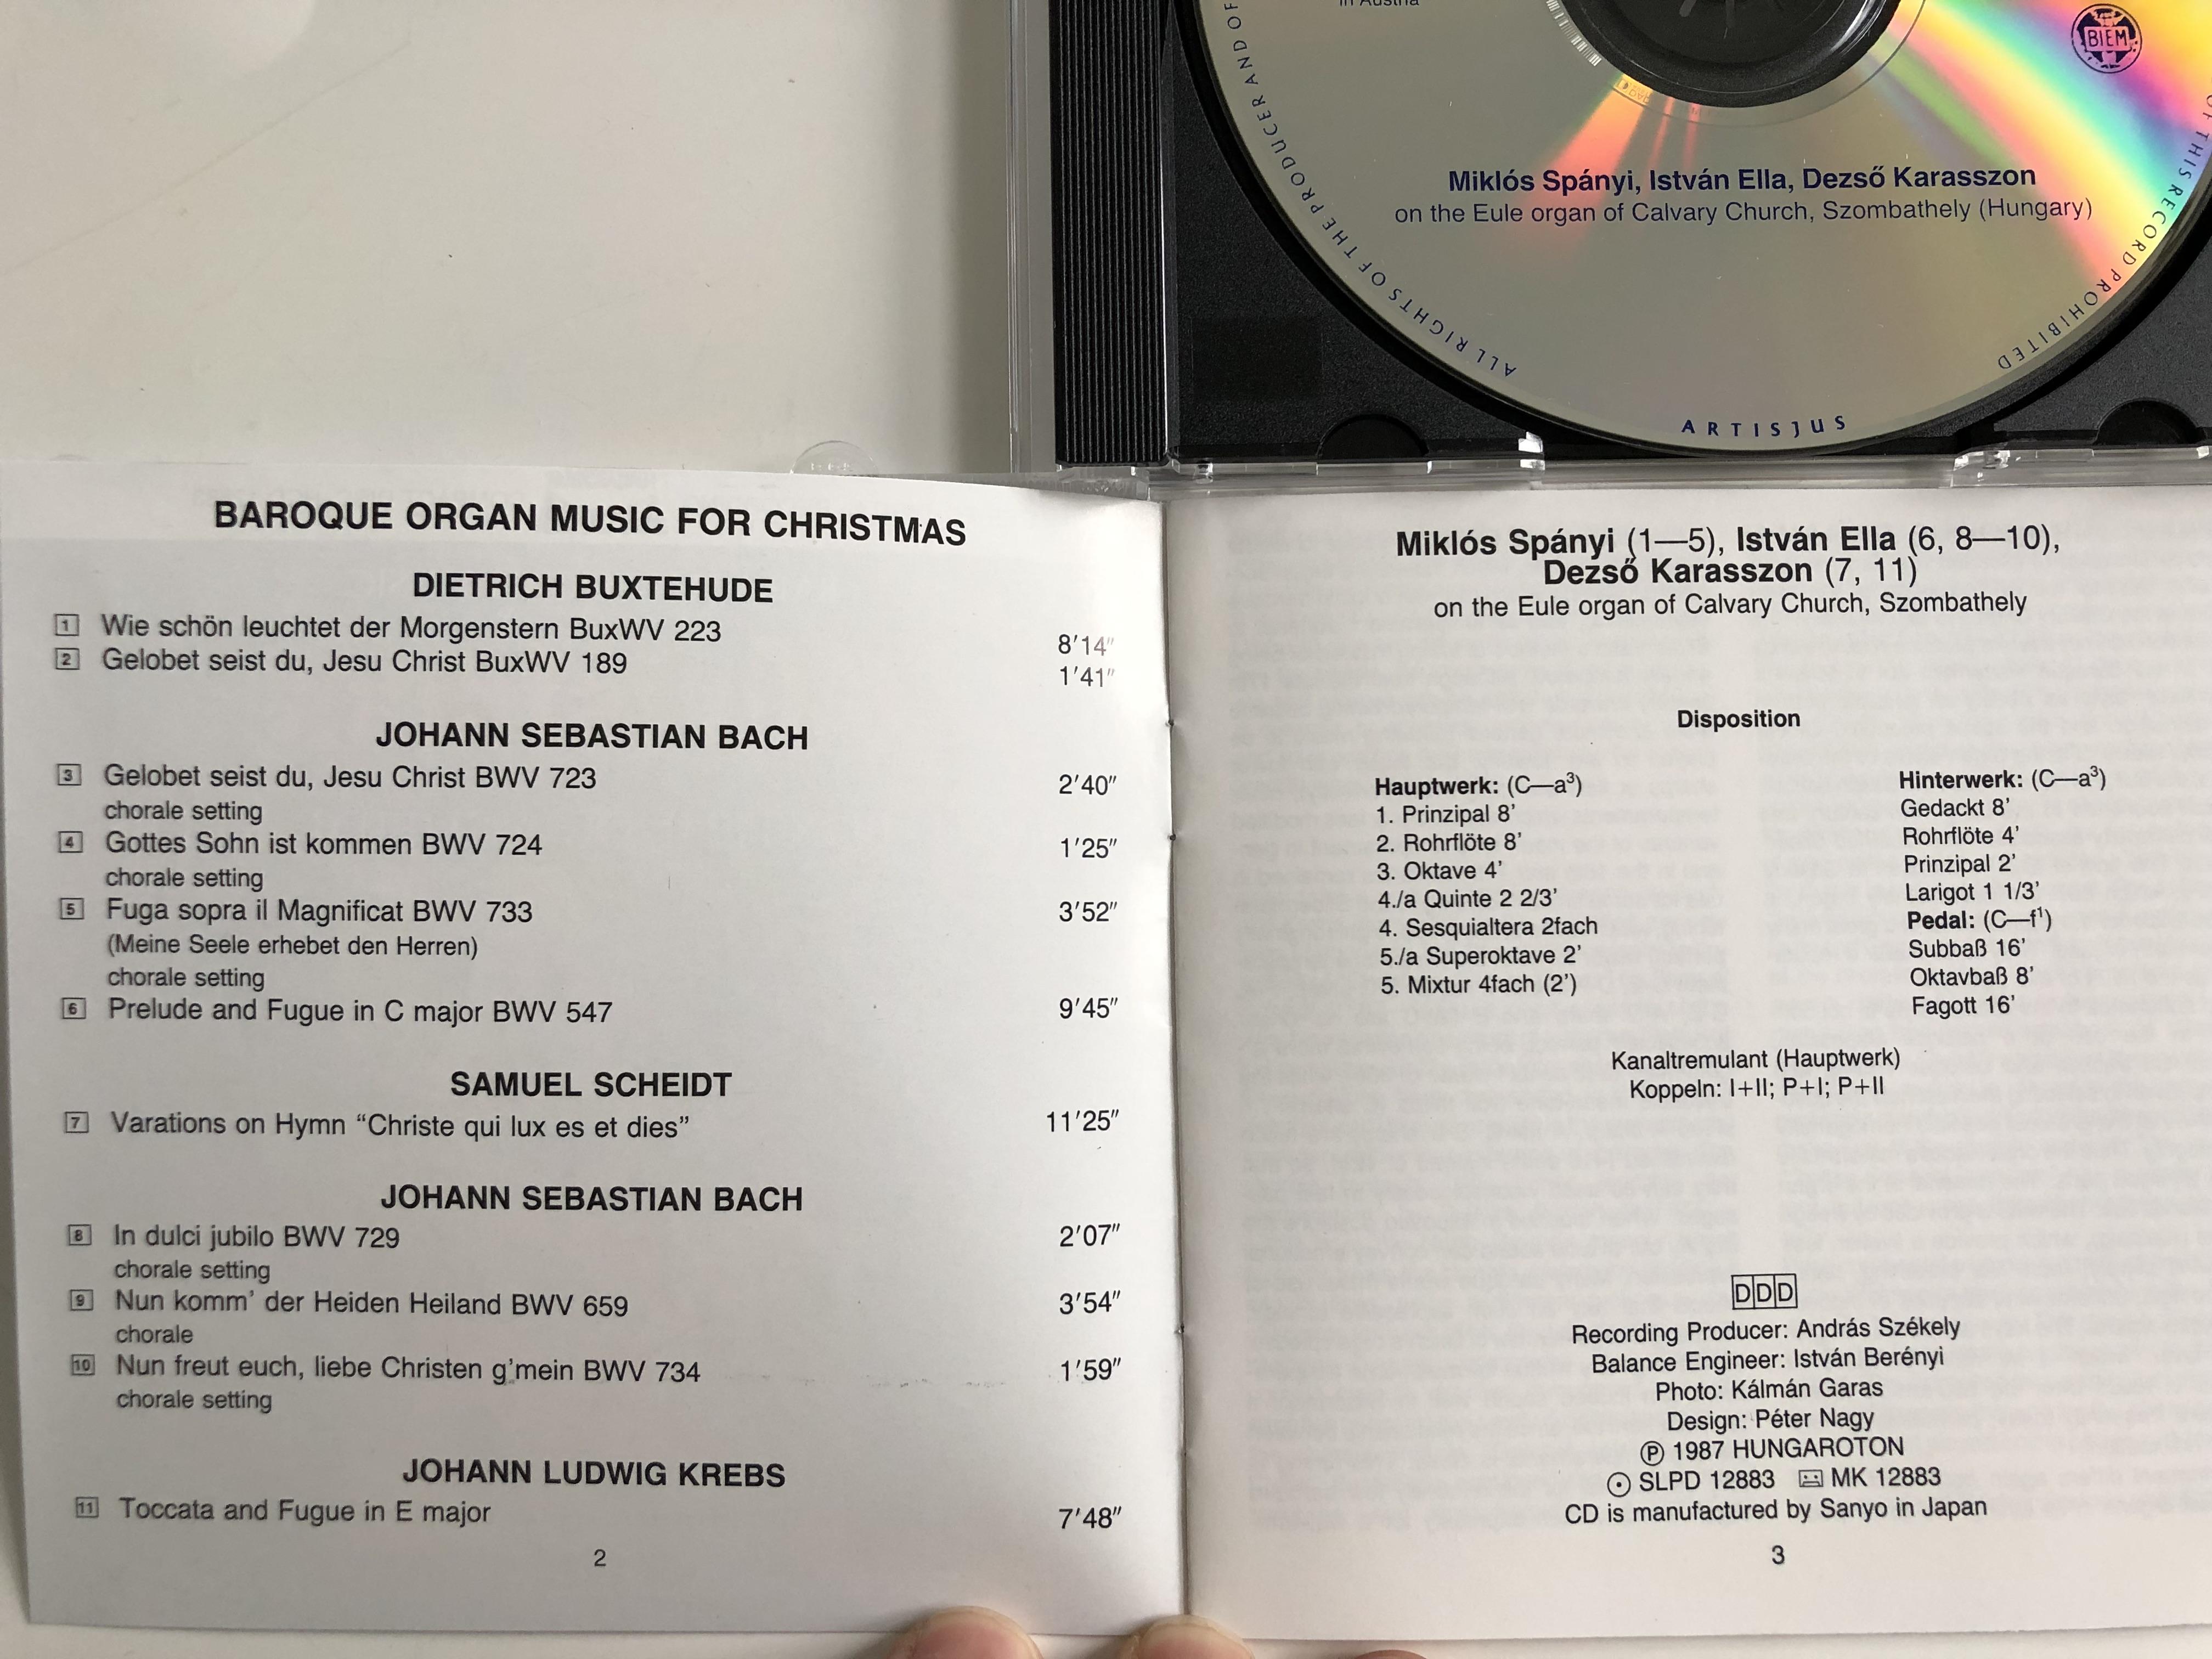 baroque-organ-music-for-christmas-bach-buxtehude-scheidt-krebs-miklos-spanyi-istv-n-ella-dezs-karasszon-hungaroton-audio-cd-1995-stereo-hcd-12883-3-.jpg